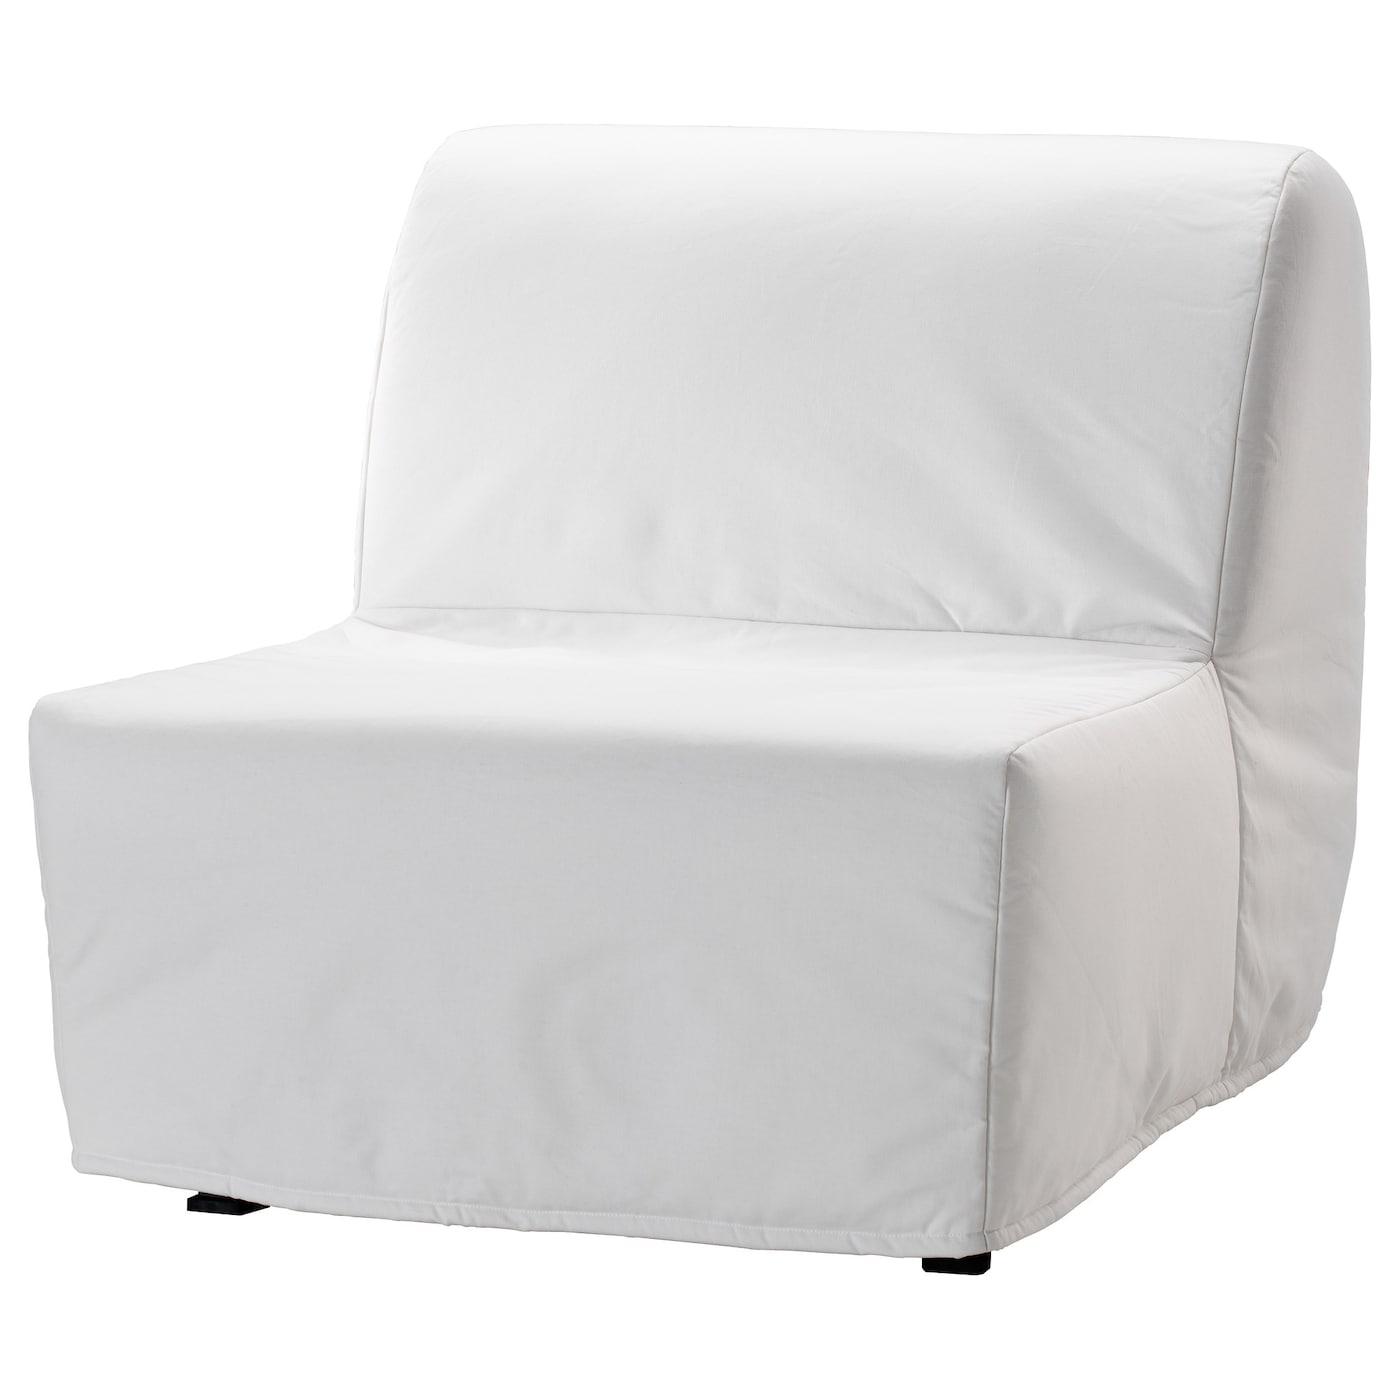 canap lit canap s lits ikea. Black Bedroom Furniture Sets. Home Design Ideas